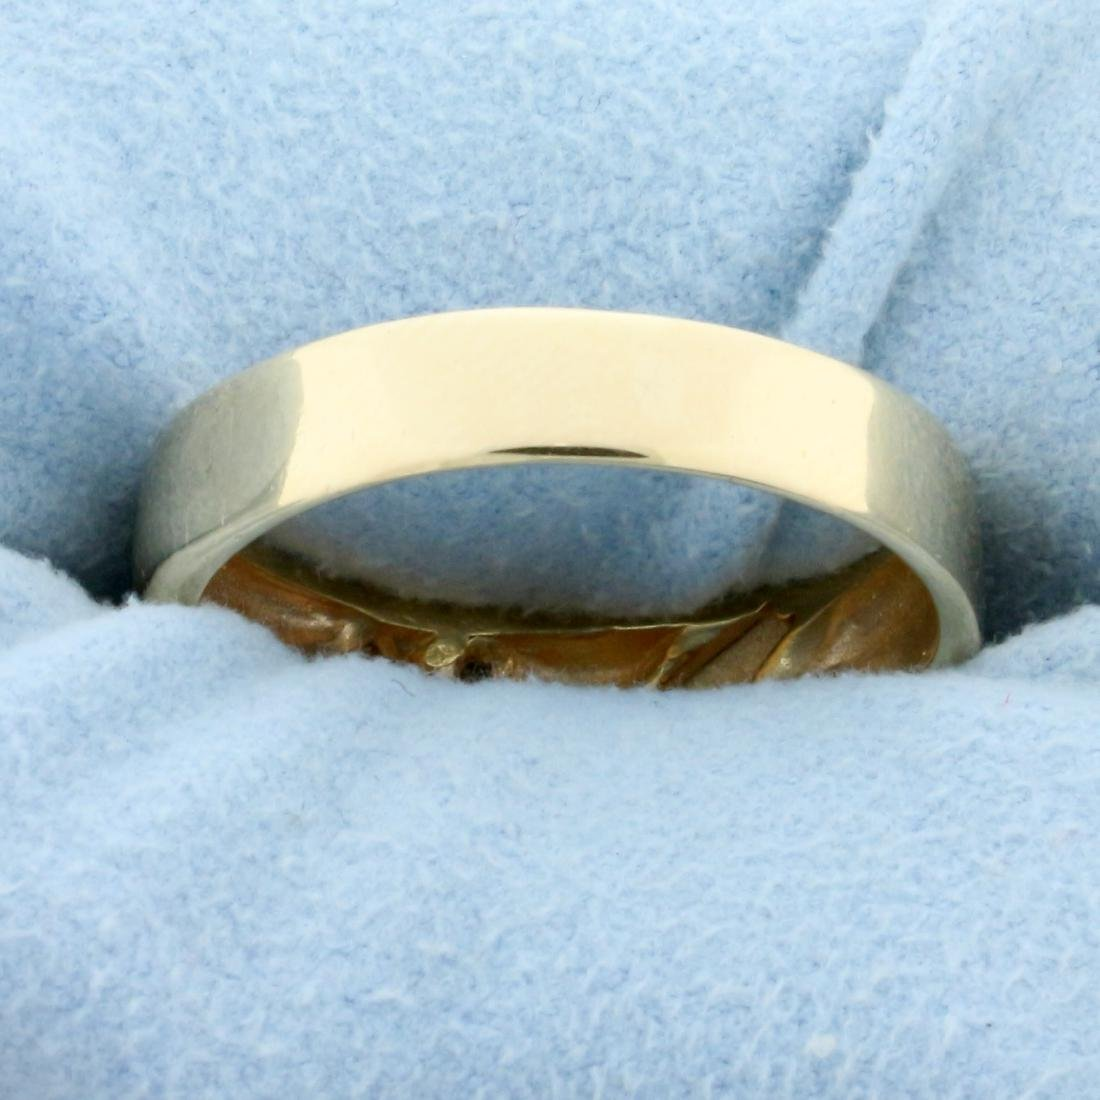 Men's Diamond Wedding or Anniversary Band Ring in 14K - 4